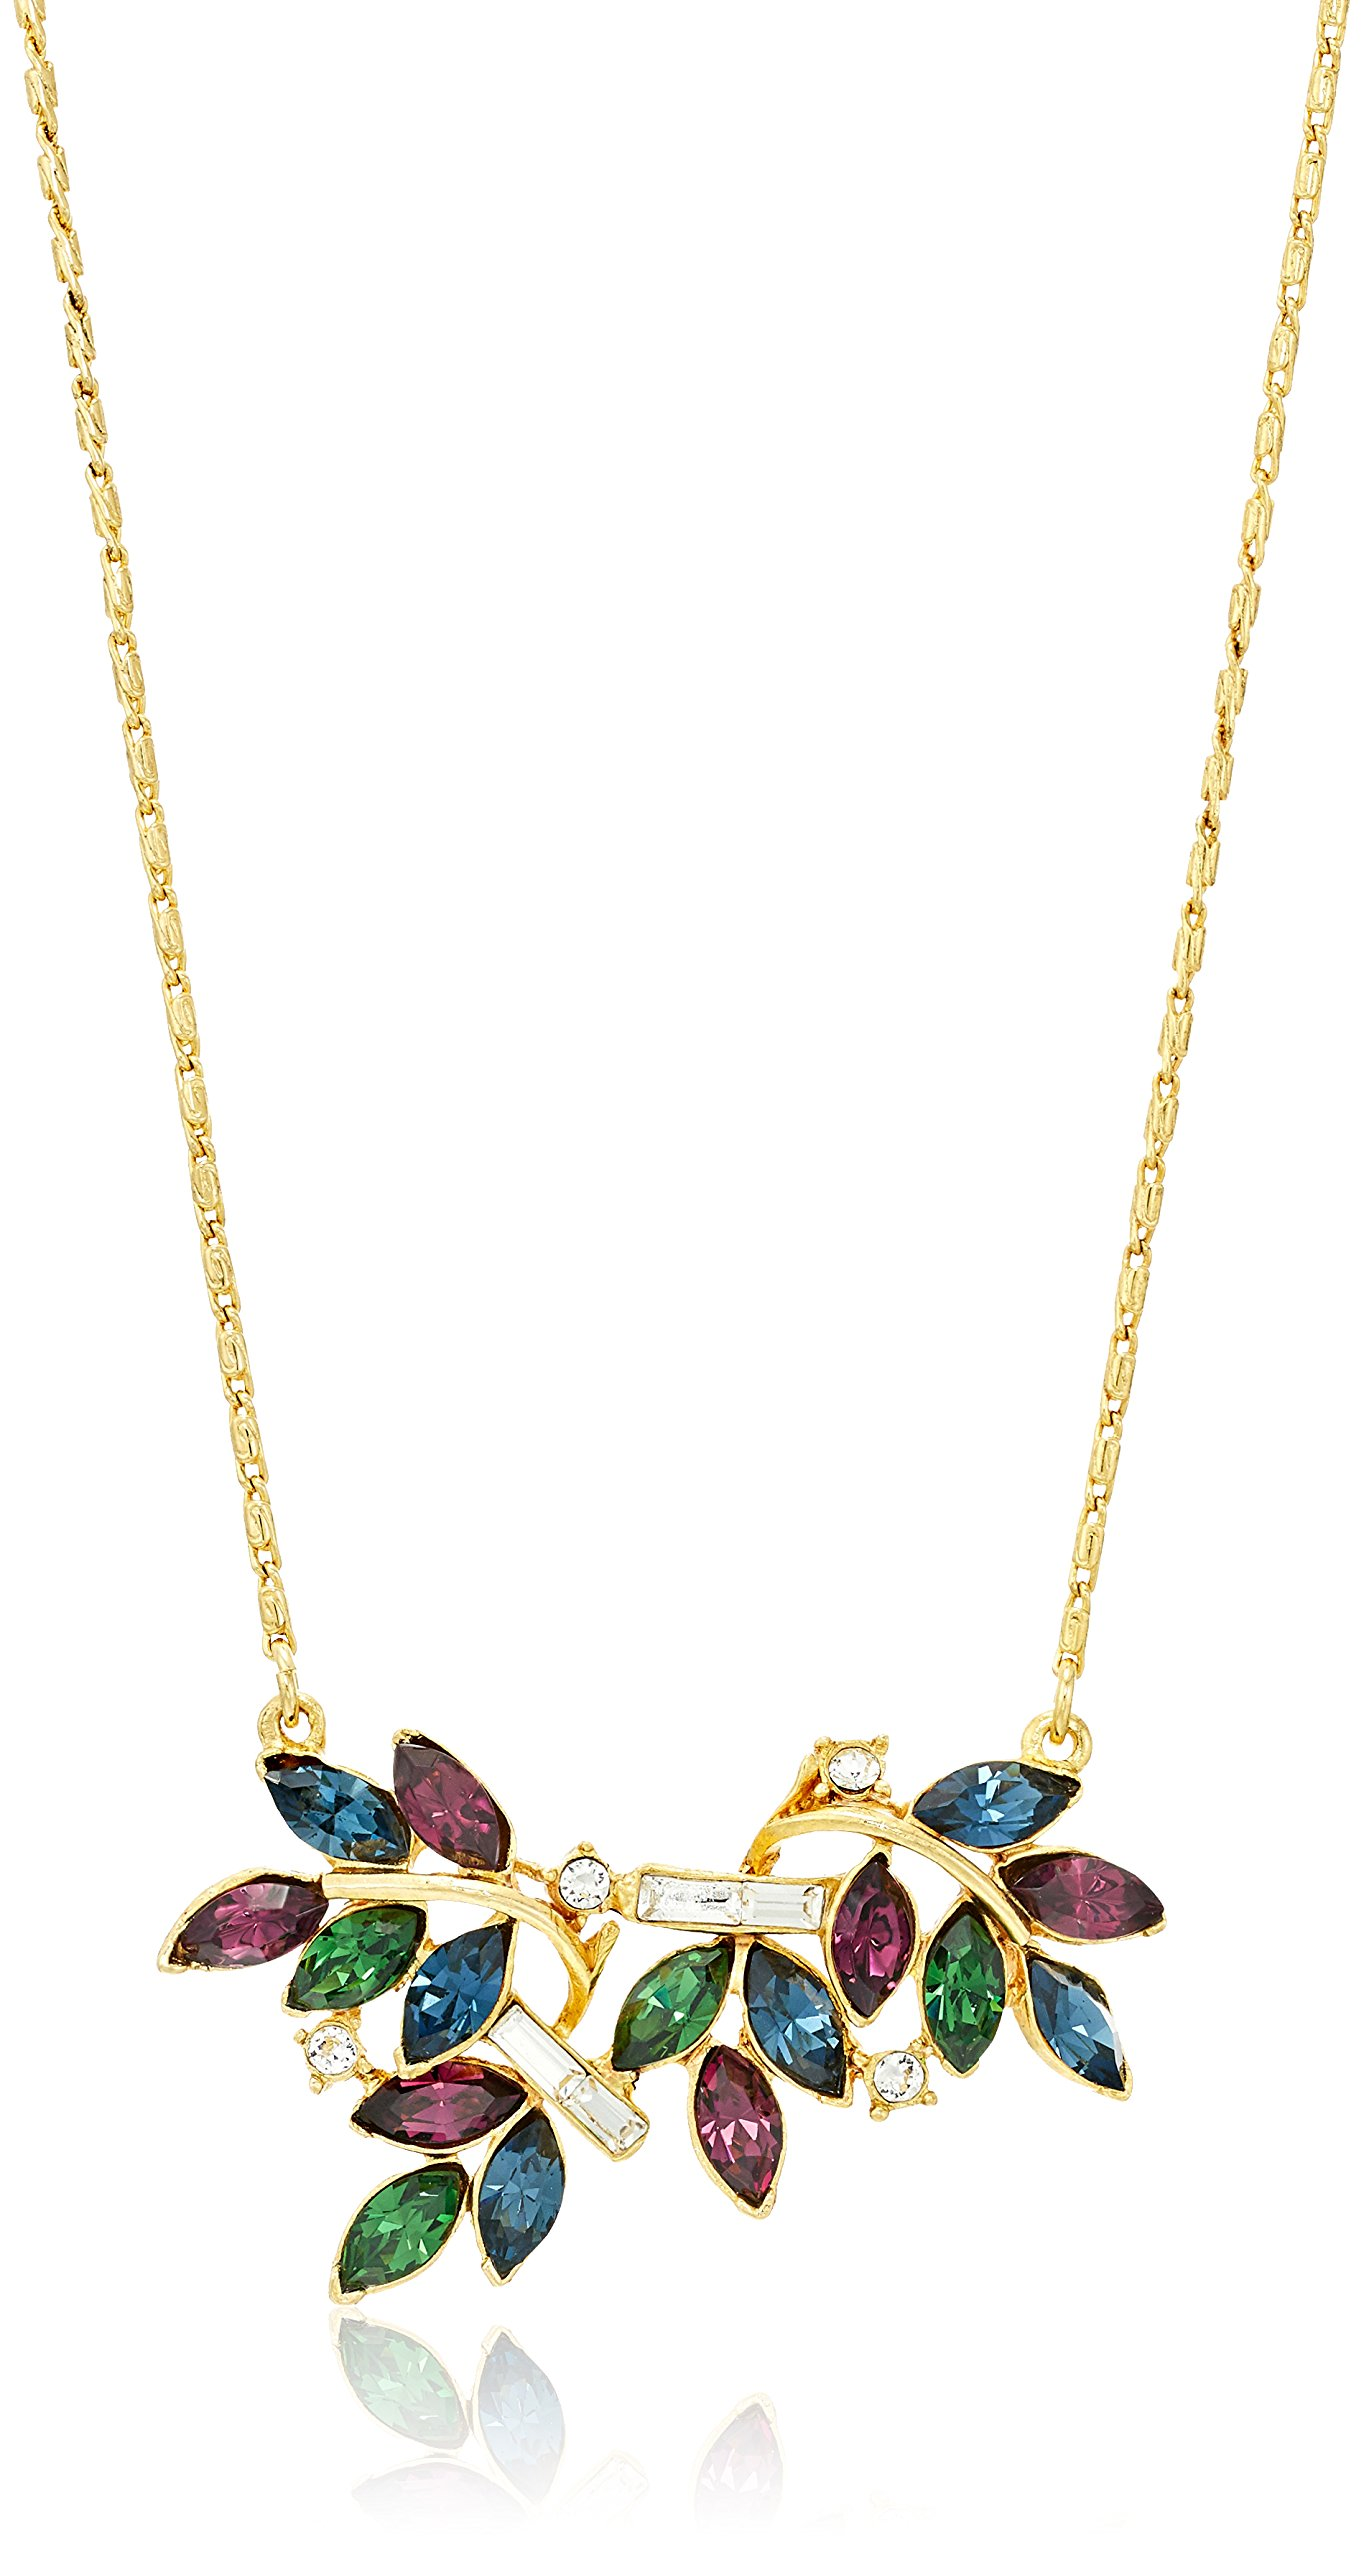 Ben-Amun Jewelry Maharaji Swarovski Crystal Floral Marquise Cut Pendant Gold Necklace, 16.5'' + 2'' Extender